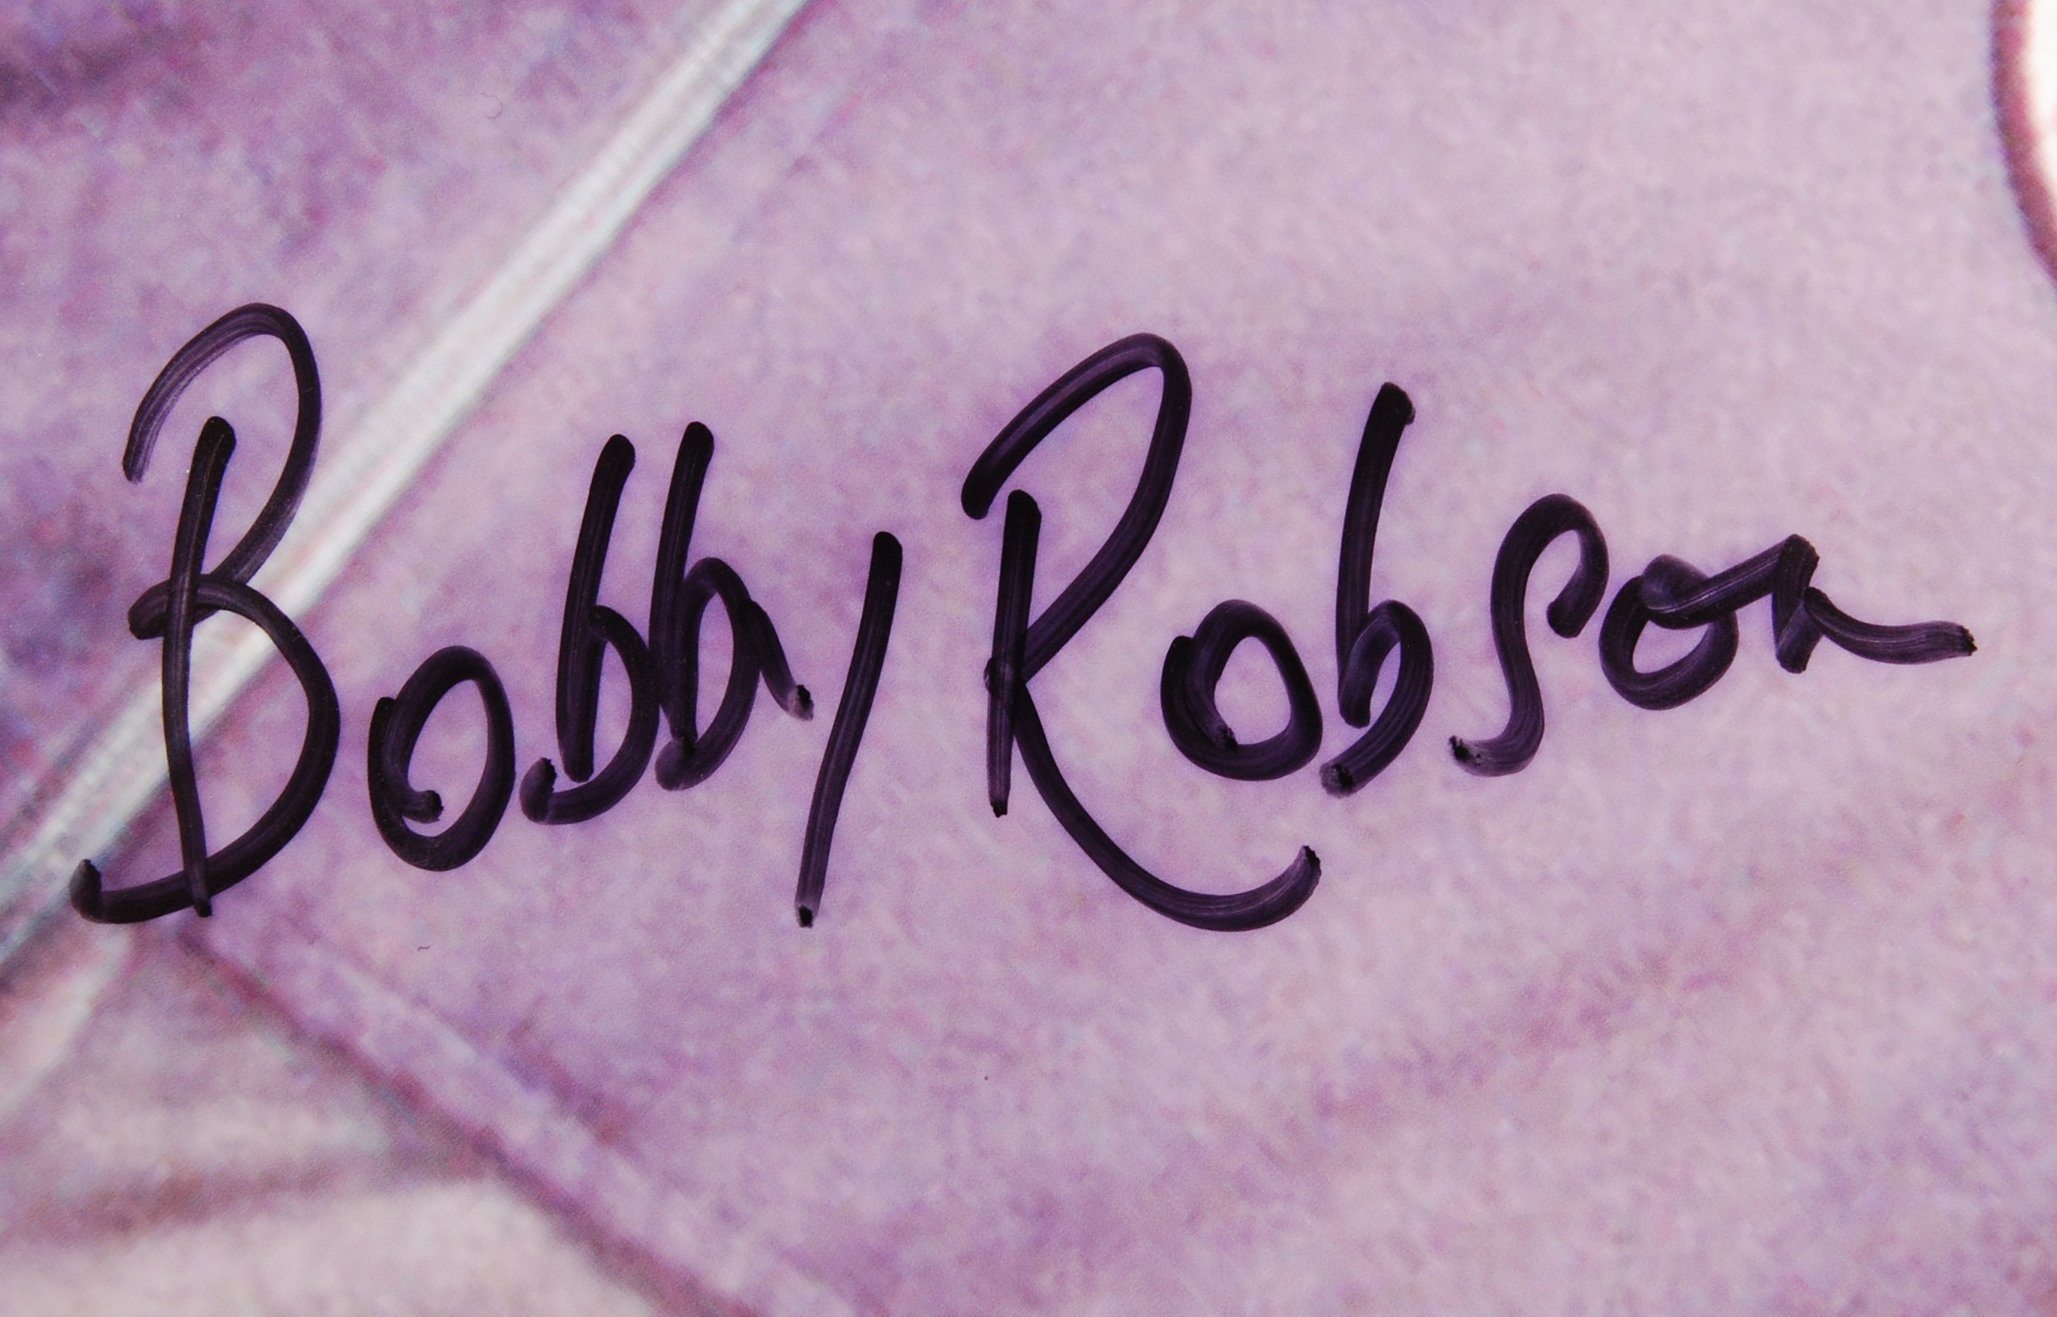 Lot 92 - SIR BOBBY ROBSON - FOOTBALL MANAGER - LARGE AUTOGR